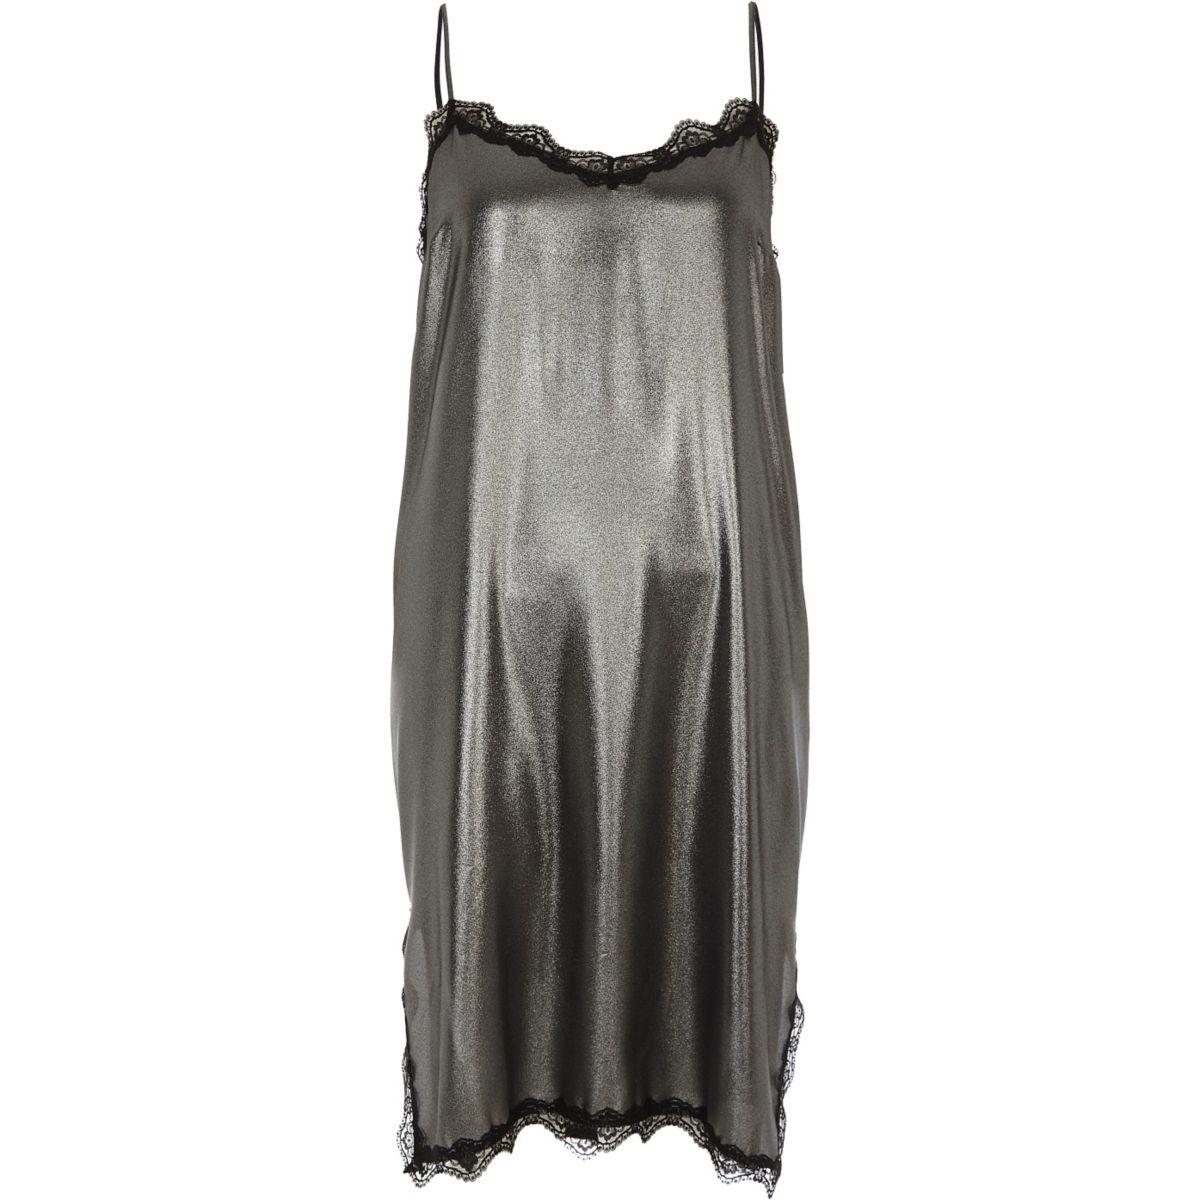 Silver metallic lace trim midi slip dress